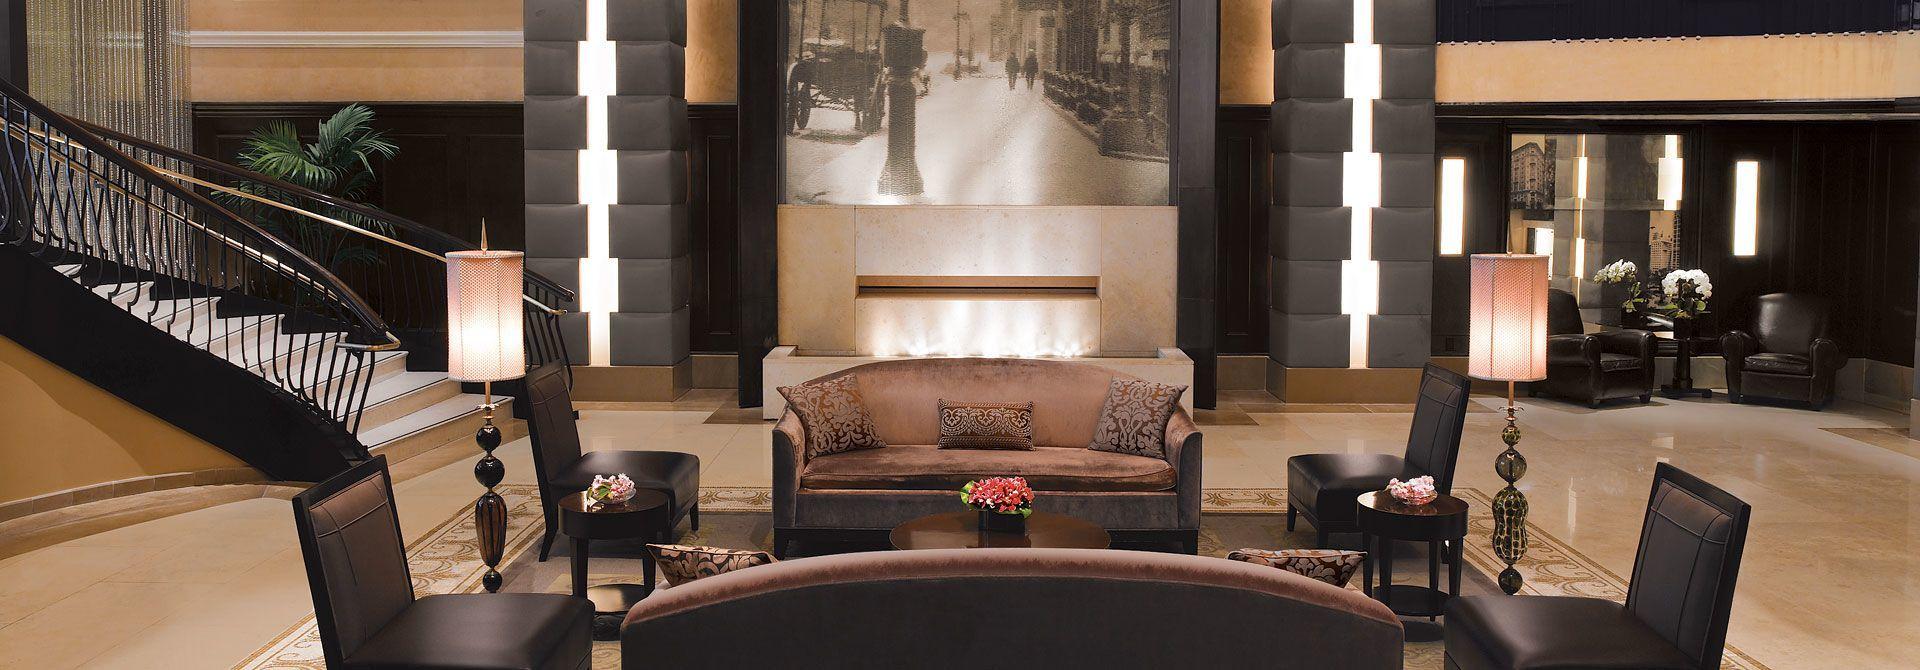 home-masthead-lobby